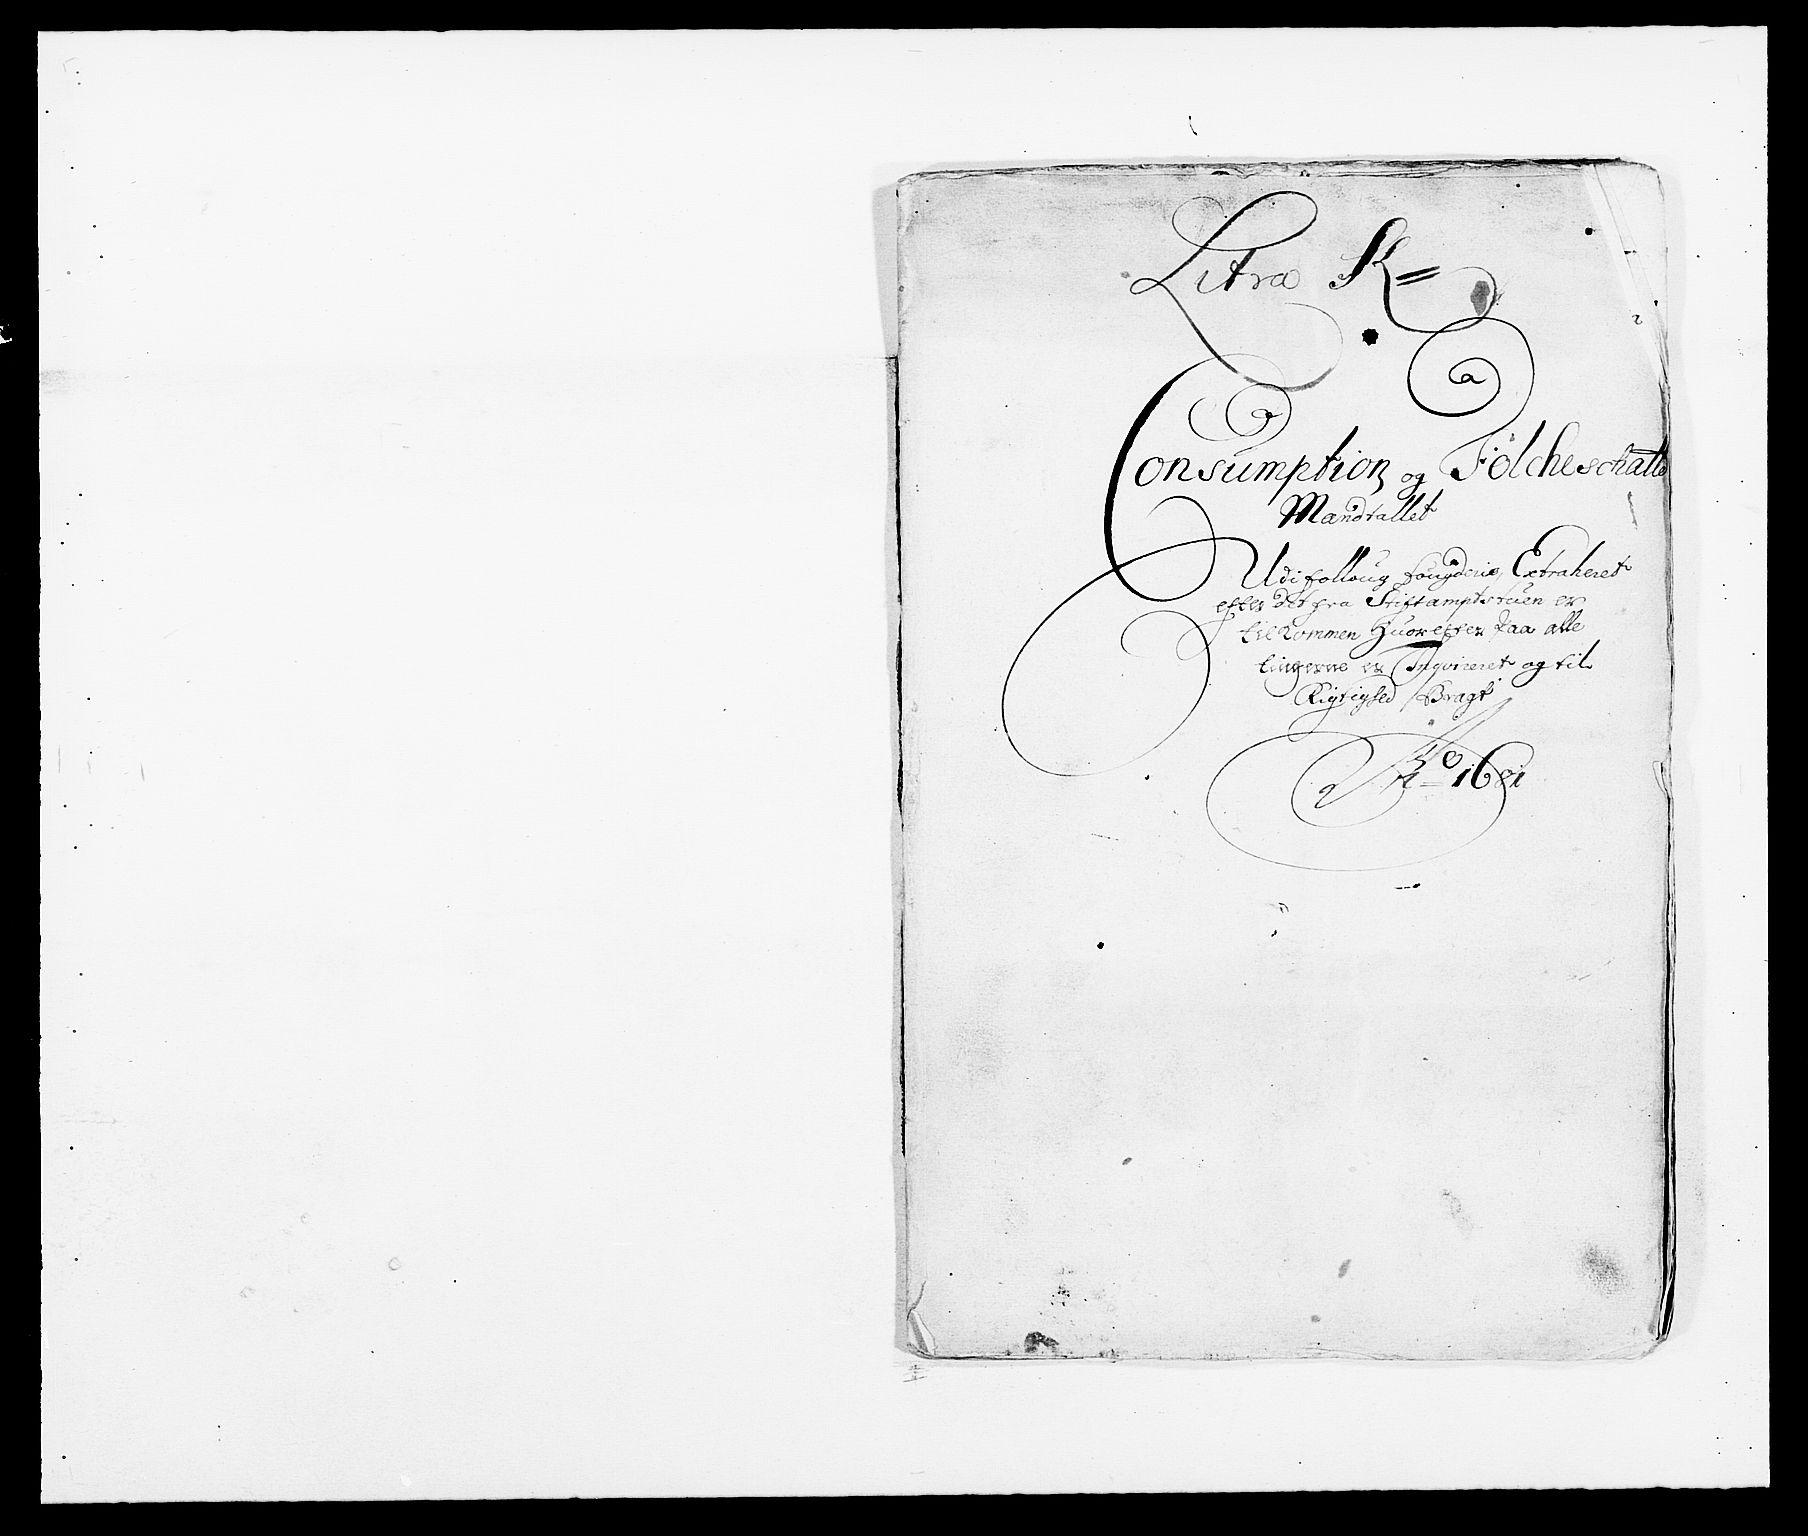 RA, Rentekammeret inntil 1814, Reviderte regnskaper, Fogderegnskap, R09/L0429: Fogderegnskap Follo, 1680-1681, s. 403